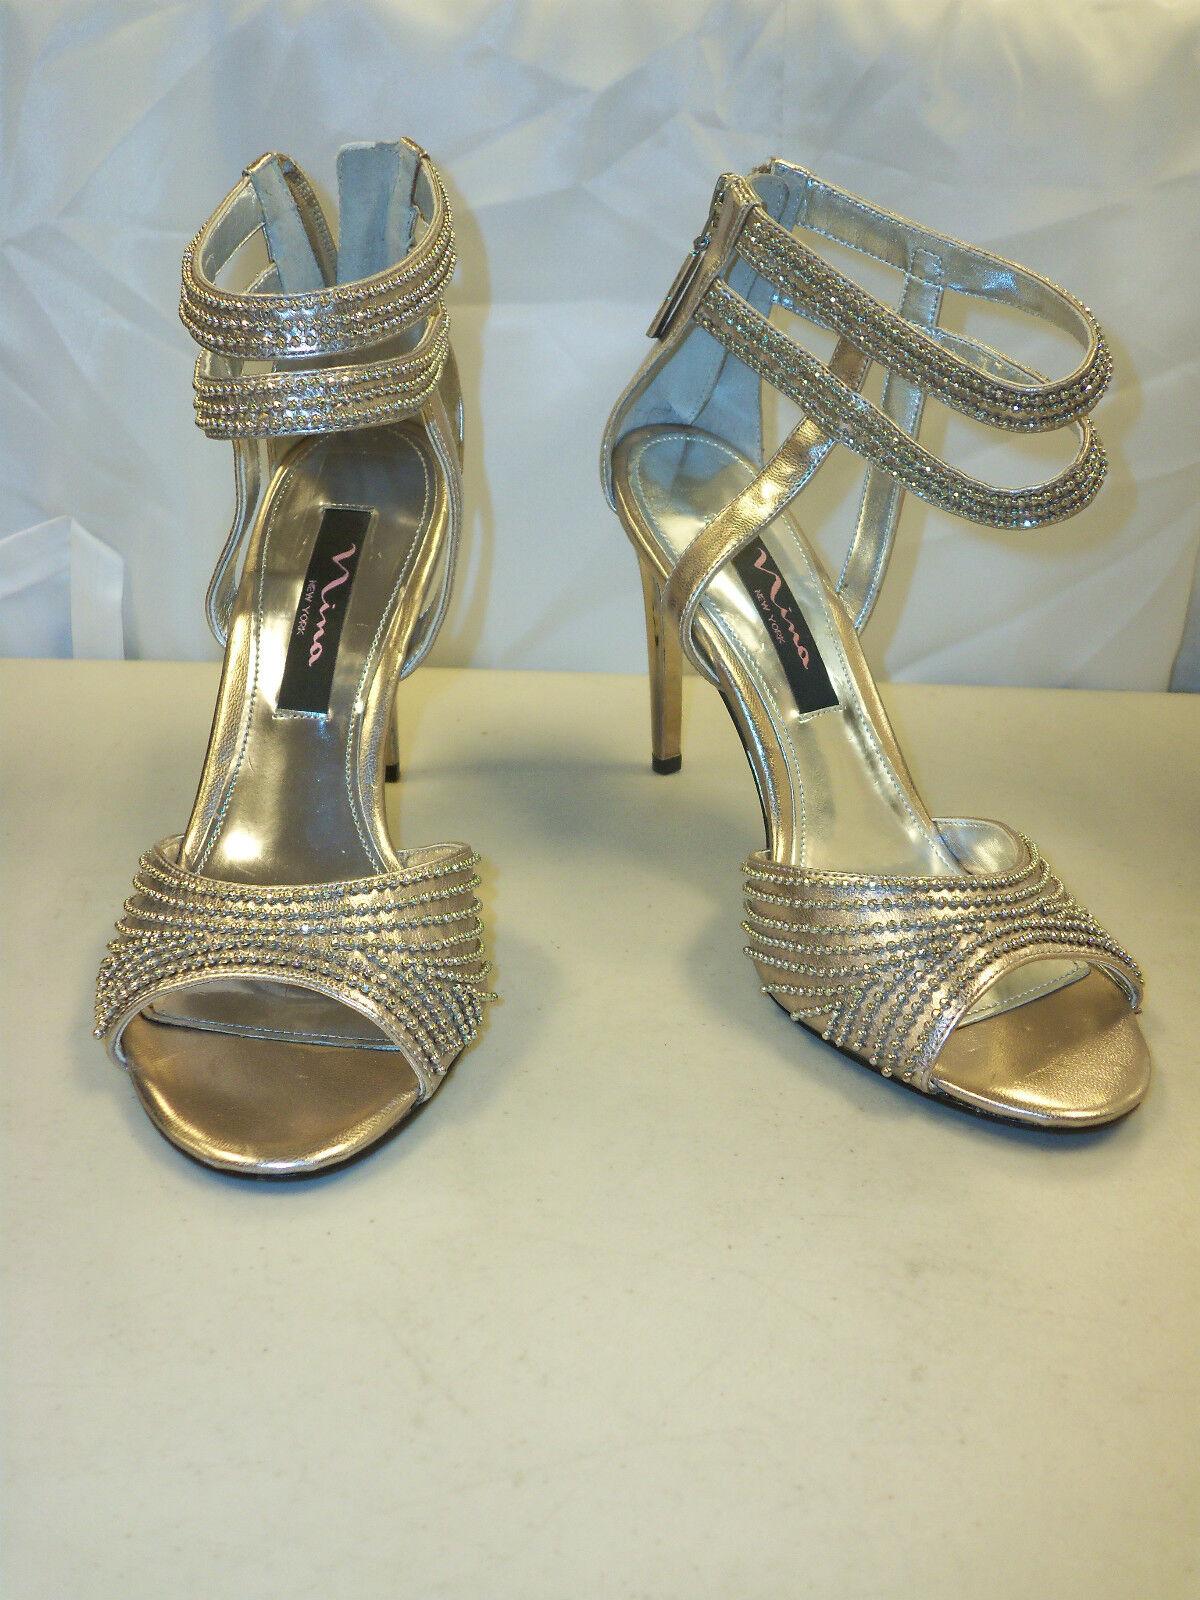 Nina New Store  Display donna Cannes Light oro Heels 7 M scarpe  vendita online